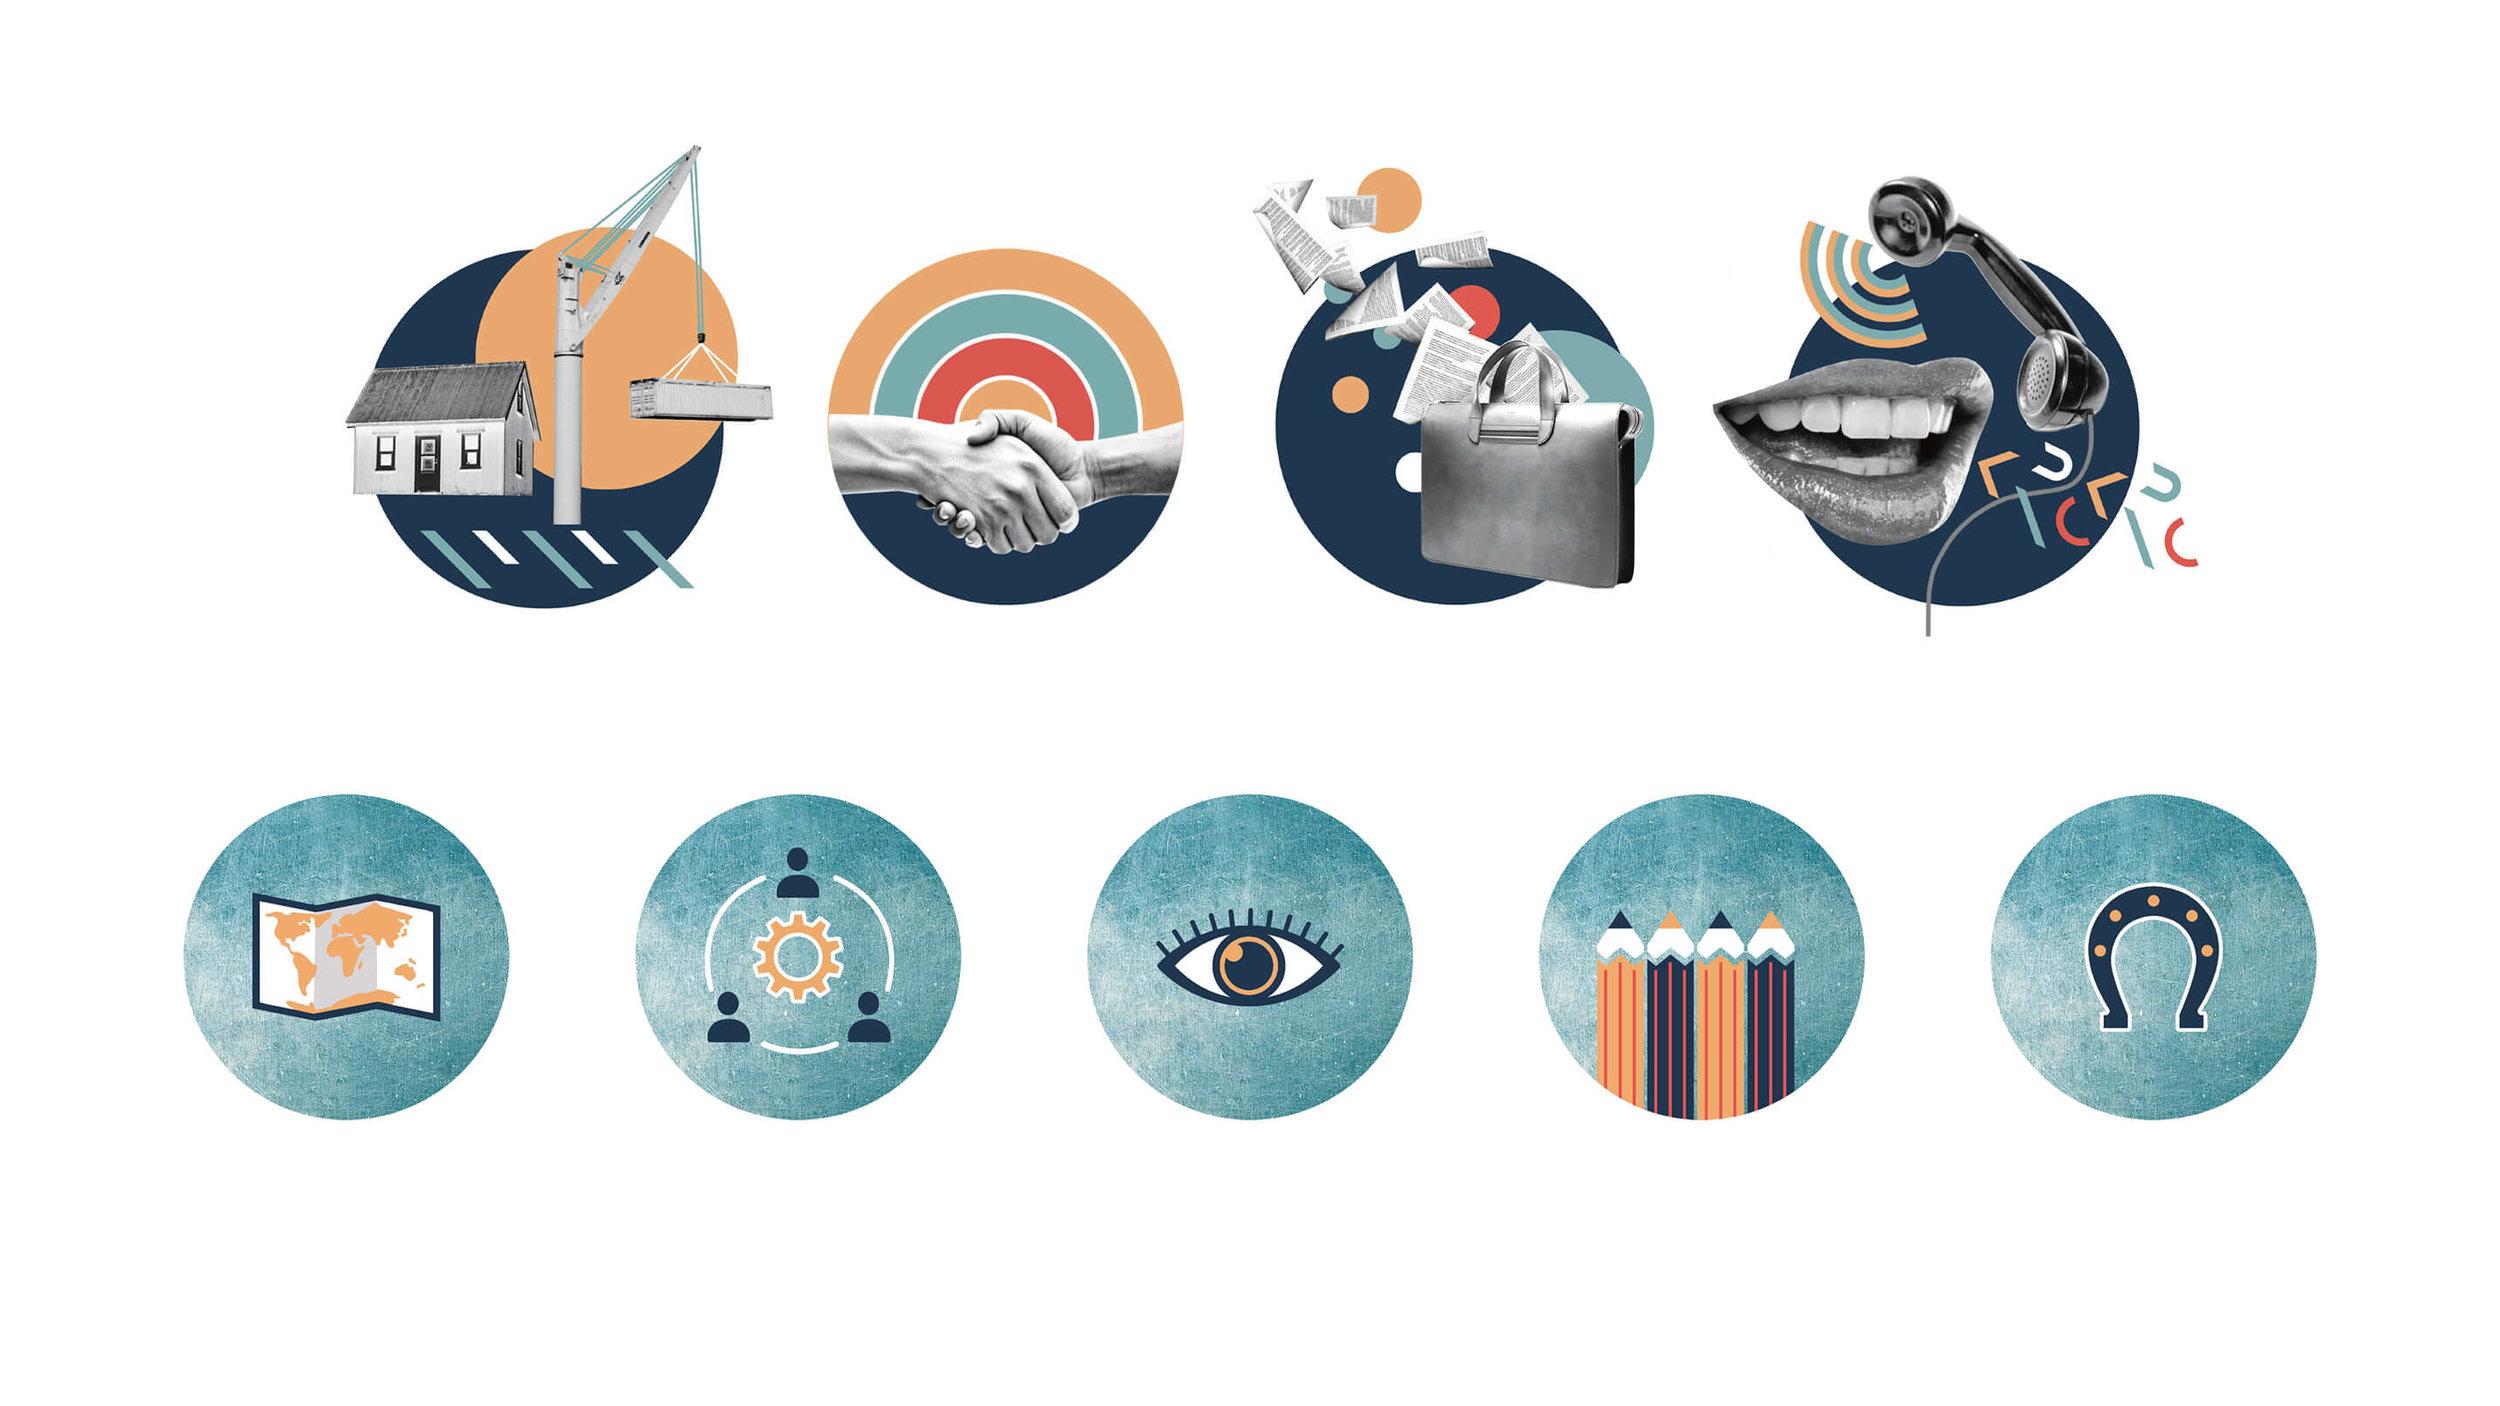 PRISM_BKR_Illustration_Icons.jpg